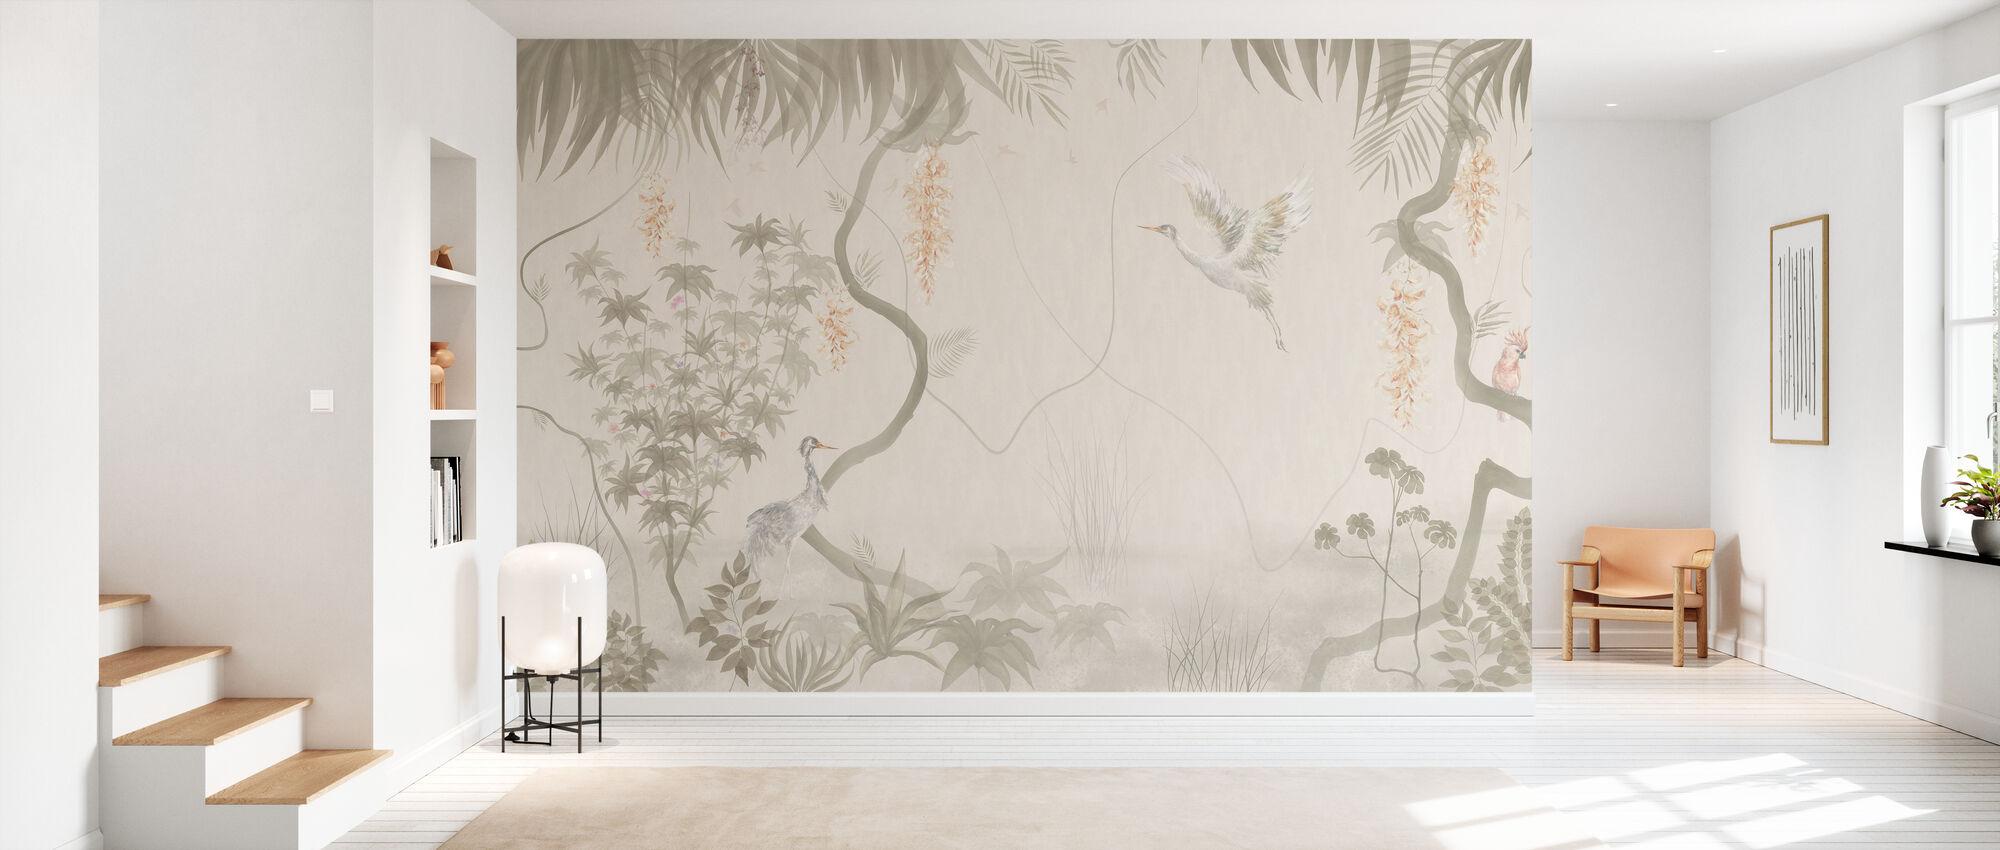 Tranquil Scenery - Beige - Wallpaper - Hallway